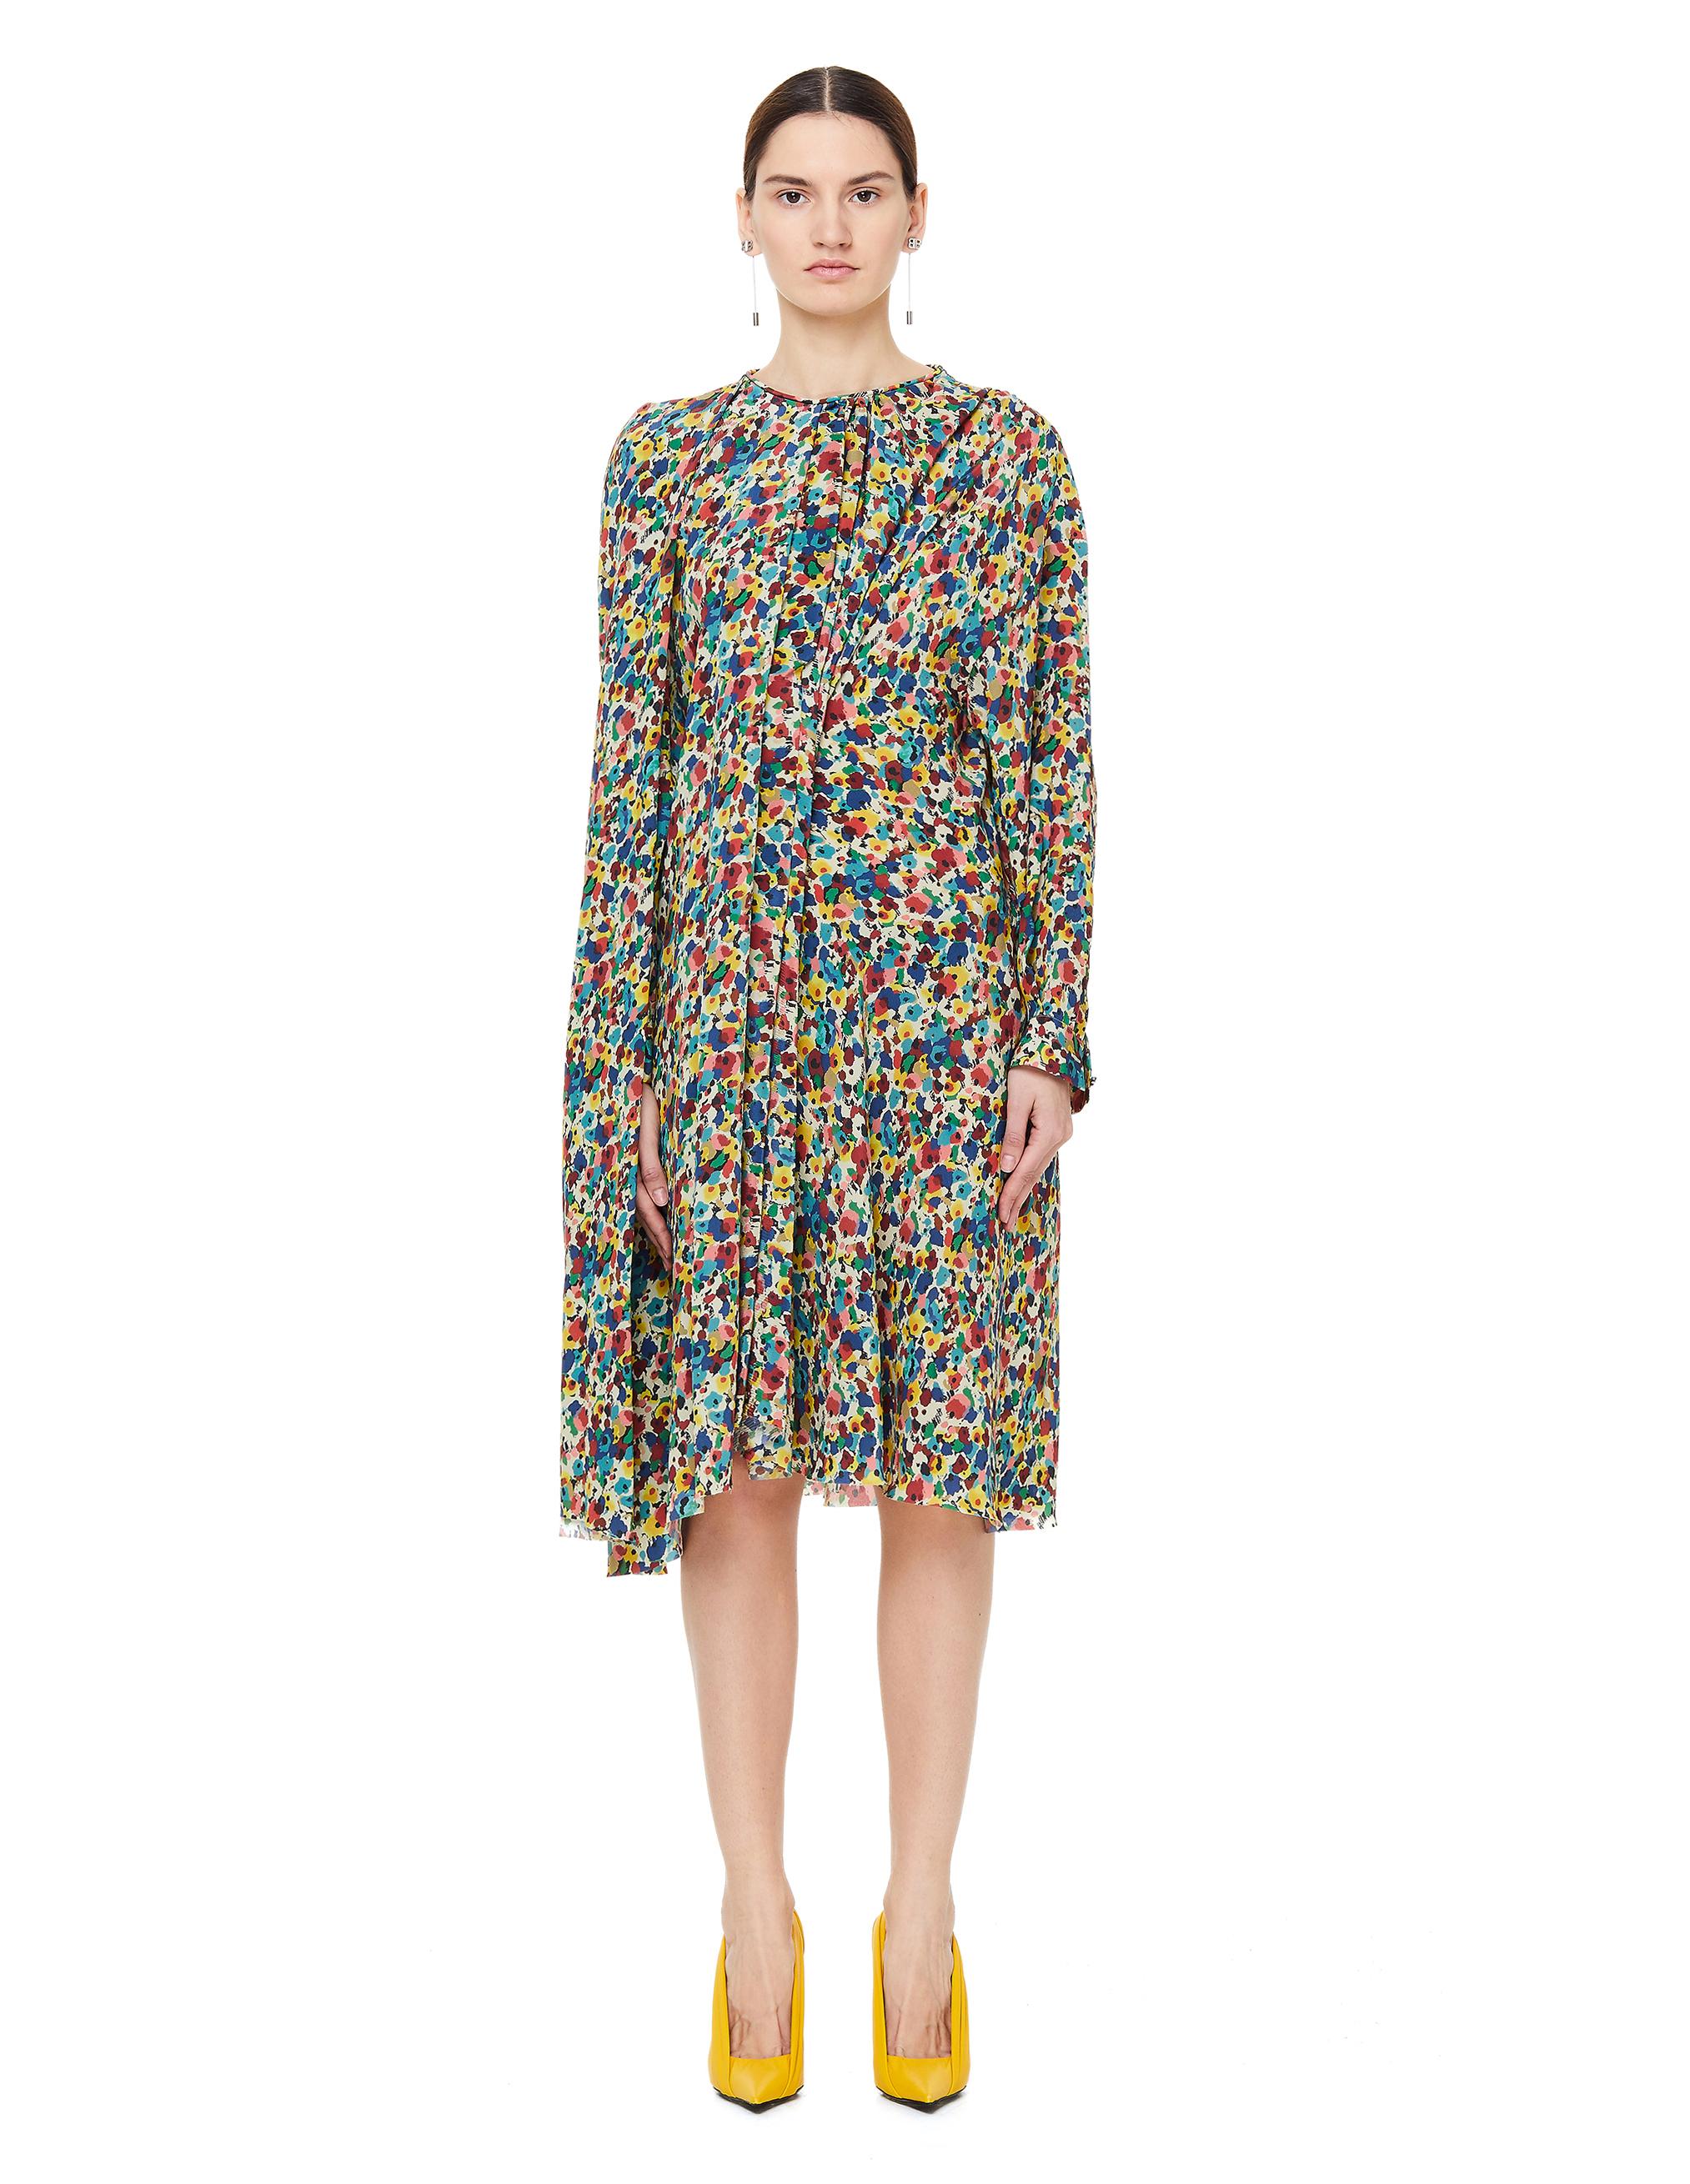 Balenciaga Silk Flower Printed Pulled Dress